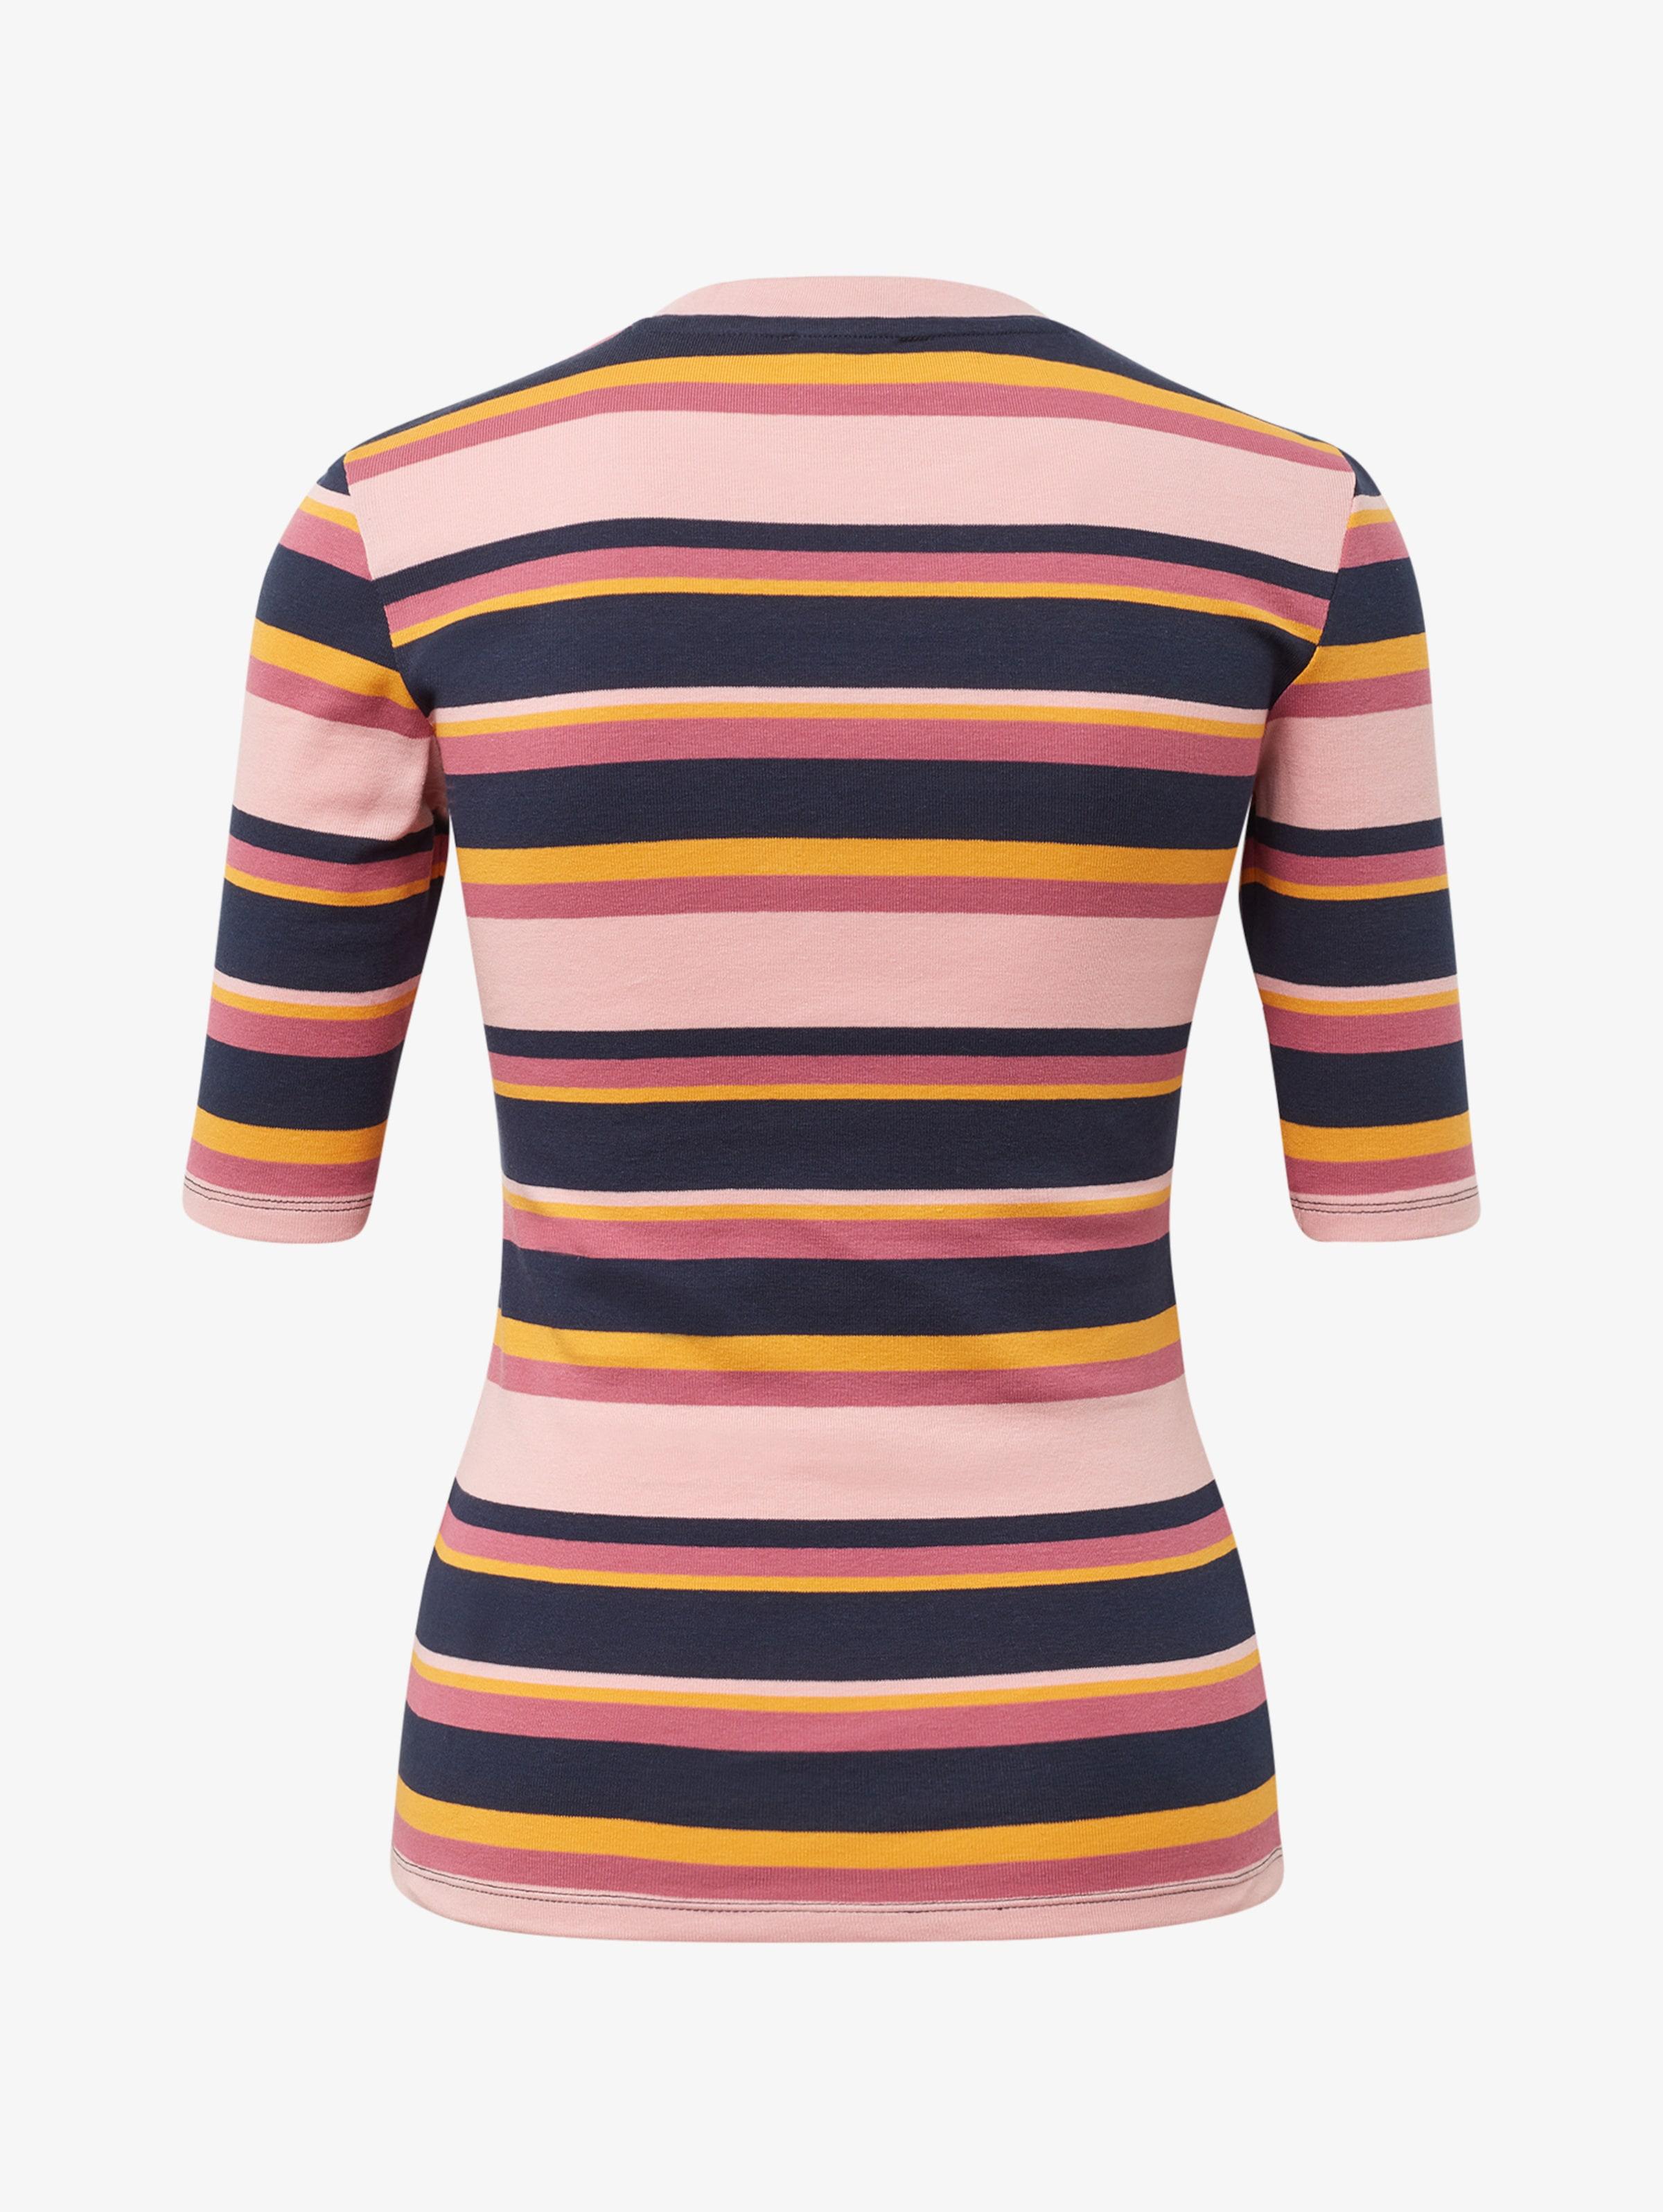 Tom BlauGelb T Tailor shirt In Altrosa Denim WD29IEH